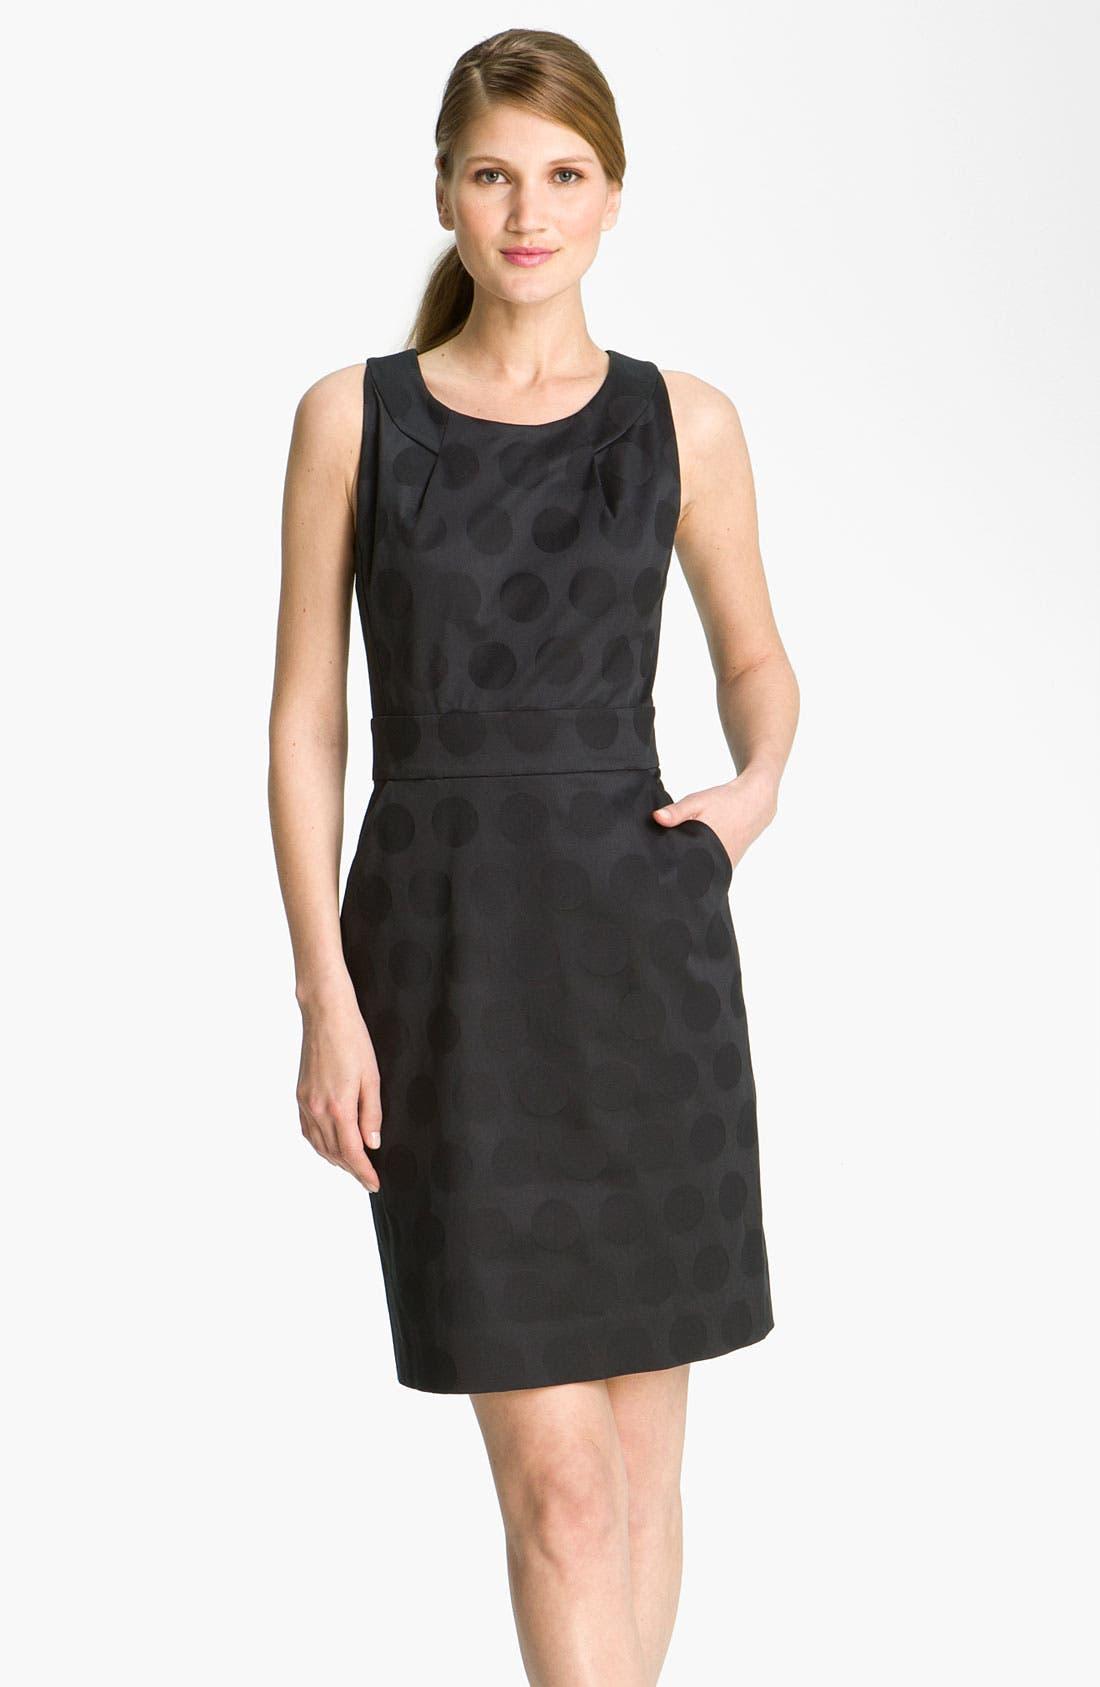 Main Image - kate spade new york 'alme' polka dot dress